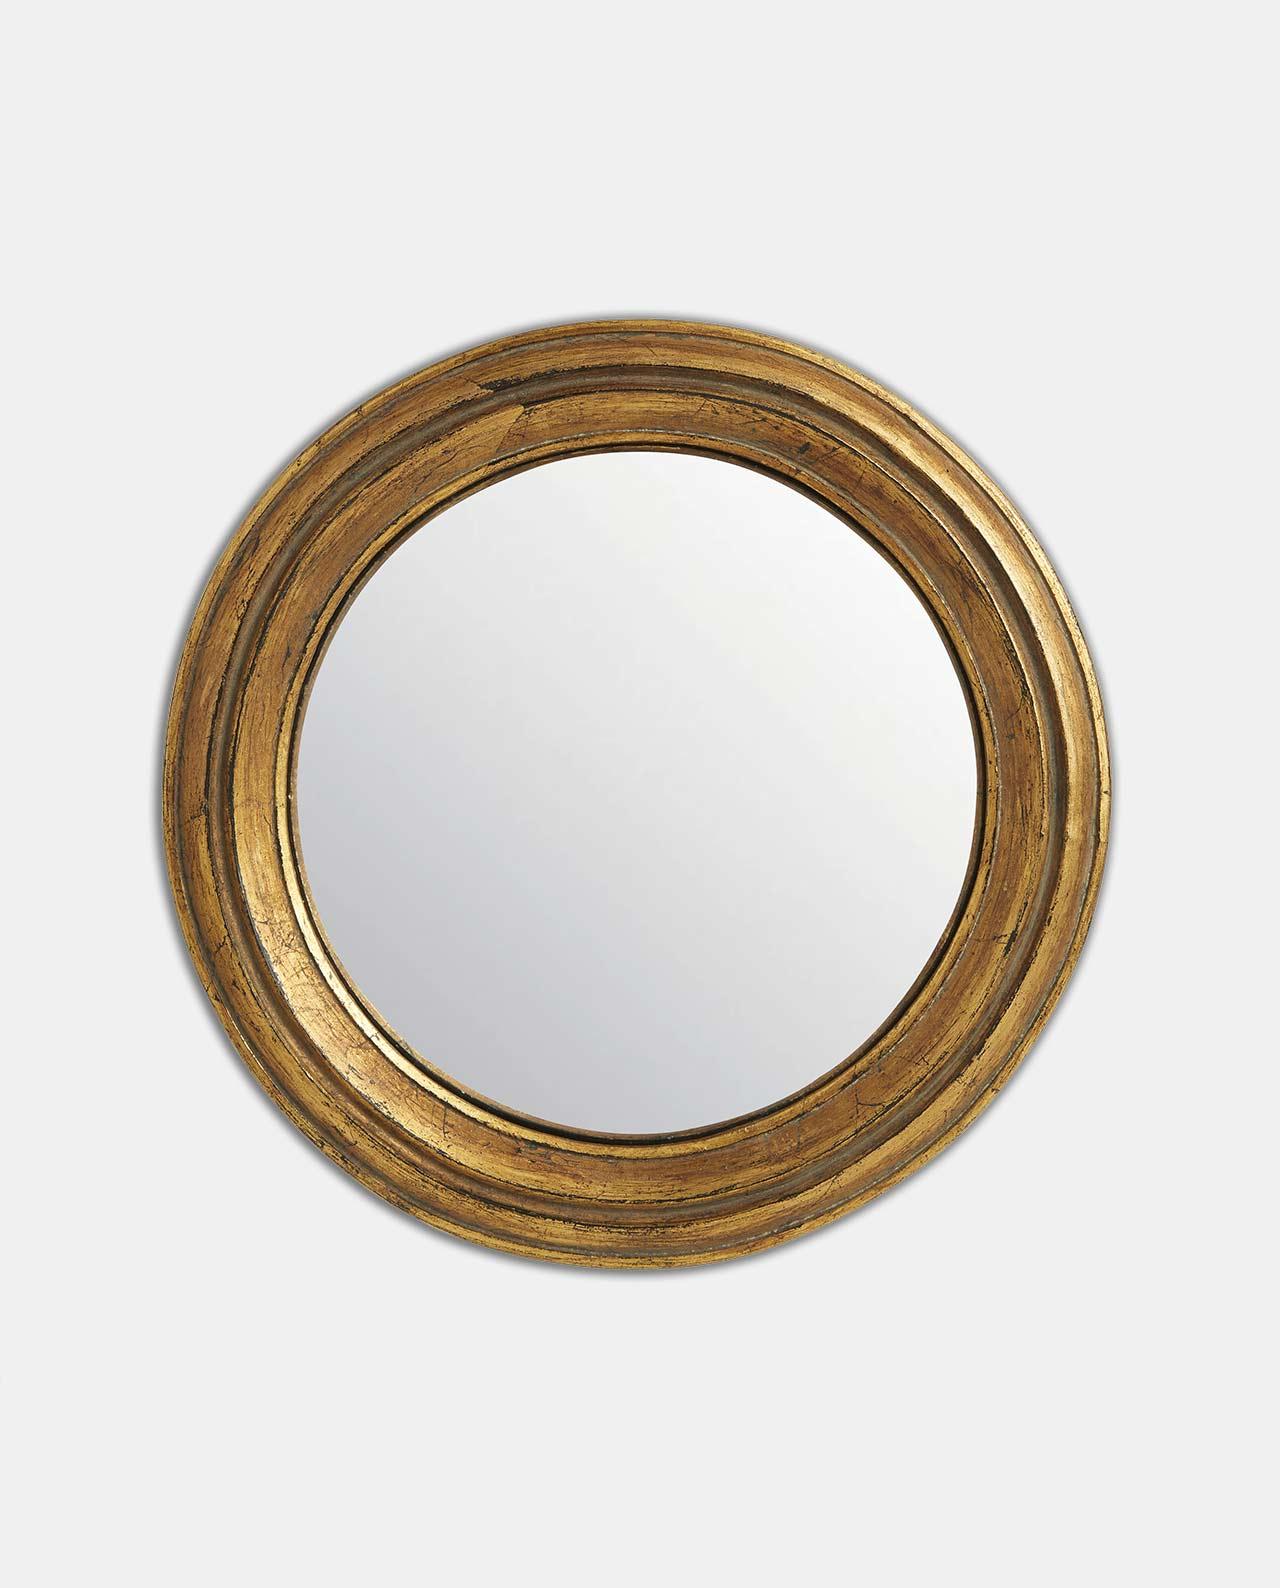 Gold Round Convex Mirror 23cm